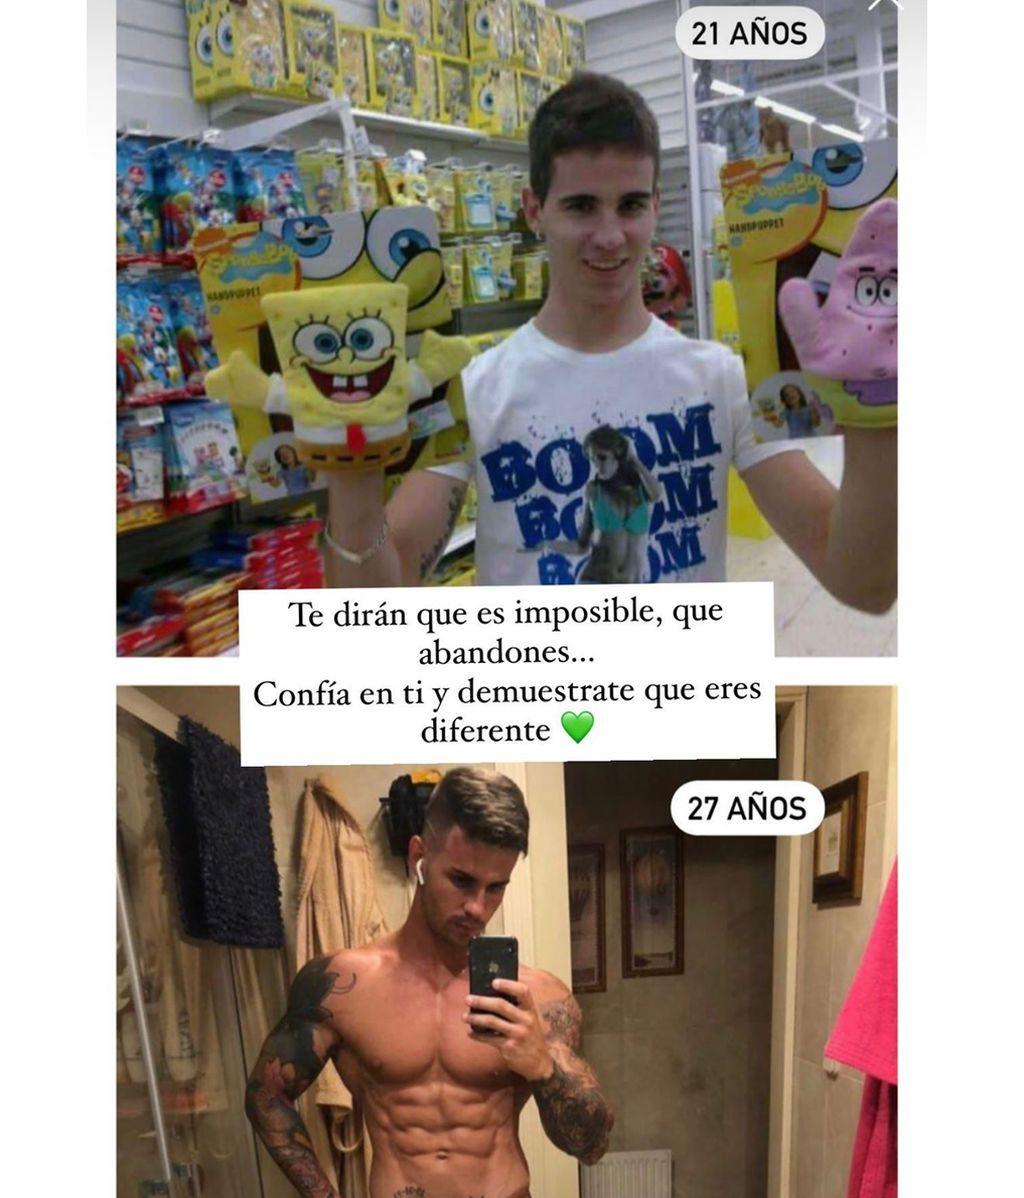 alexbueno